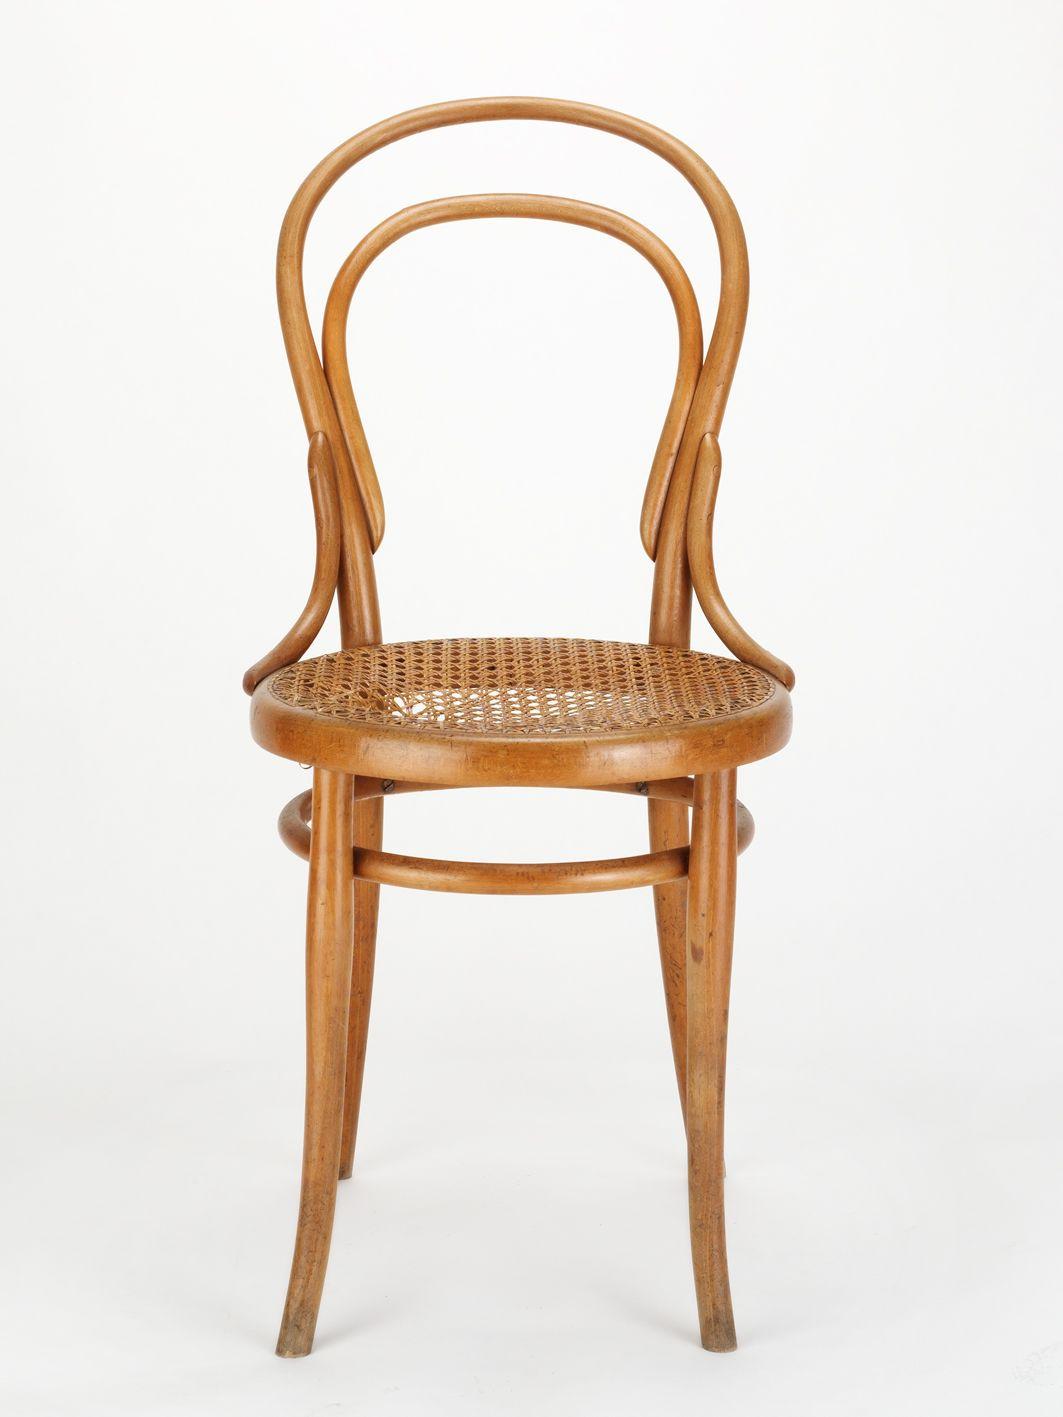 Gebruder Thonet Thonet Nr 14 Um 1895 Bauhaus Mobel Stuhl Design Design